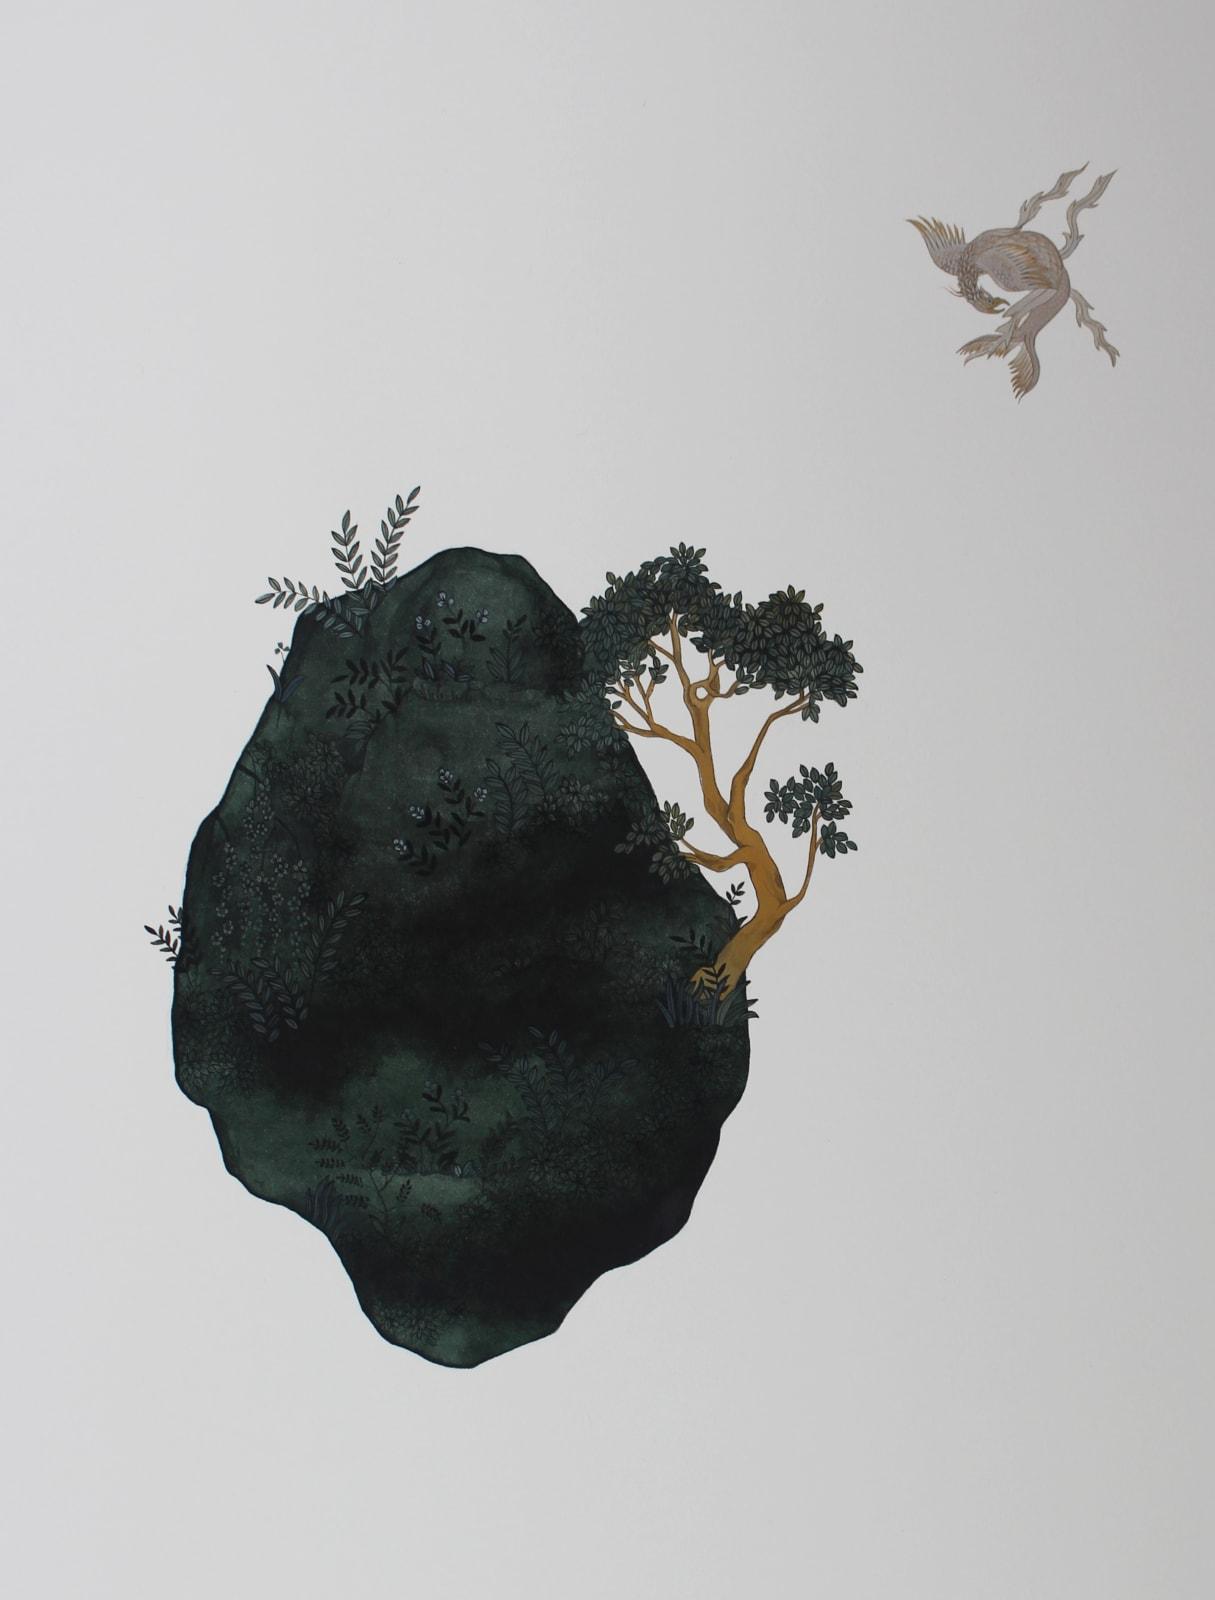 Maha Ahmed, An Unstrustworthy Bridge, 2019 Gouache on paper 40 x 33 cm